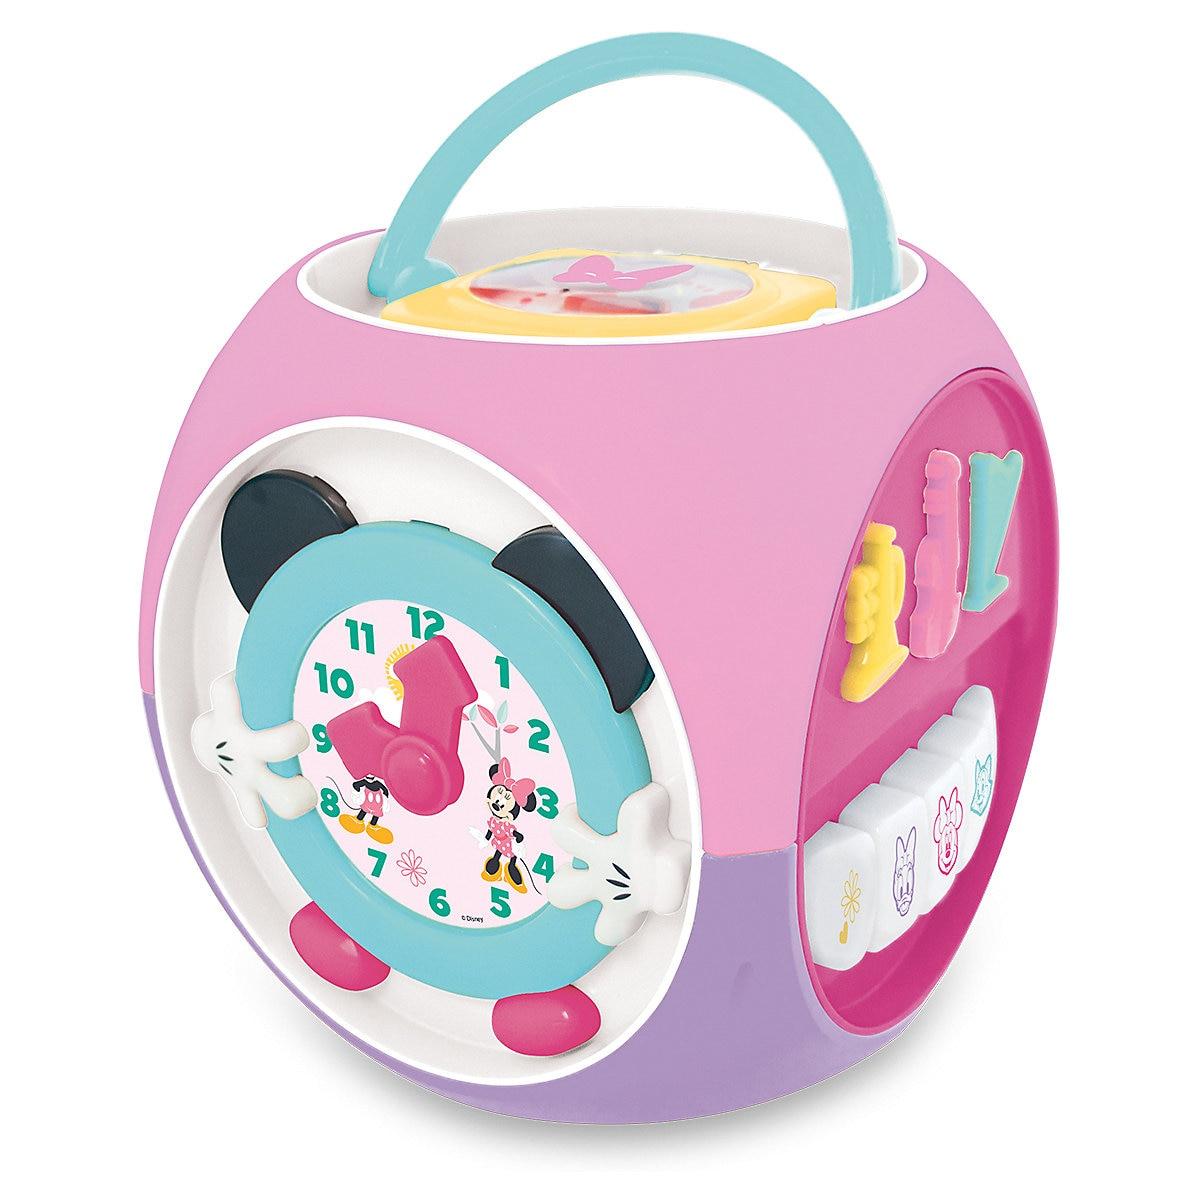 KIDDIELAND Baby Rattles & Mobiles 9508077  Bizybord Toy Games MTpromo